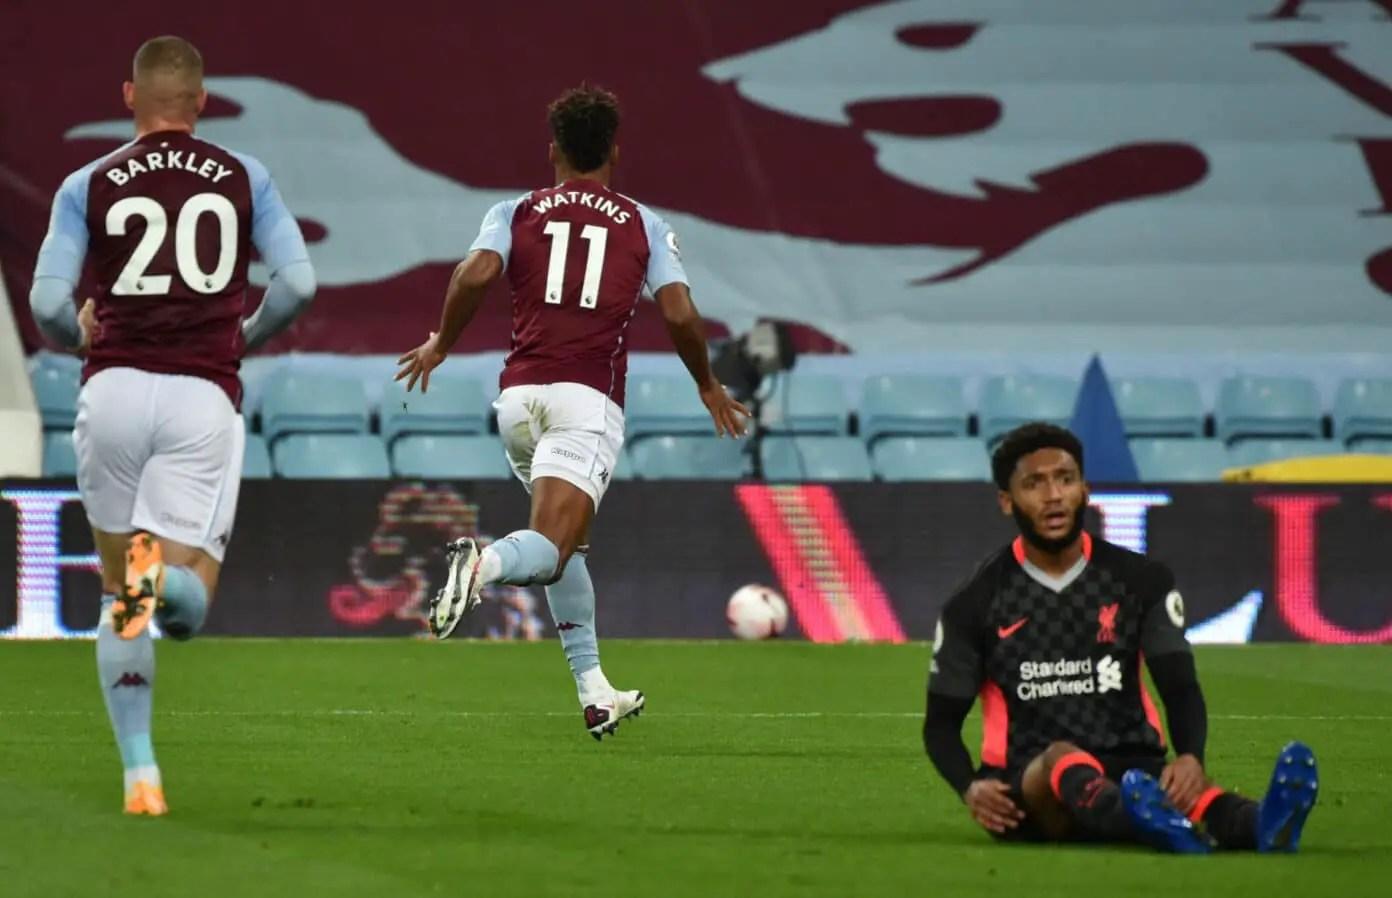 Aston Villa 7-2 Liverpool – As it happened & reaction